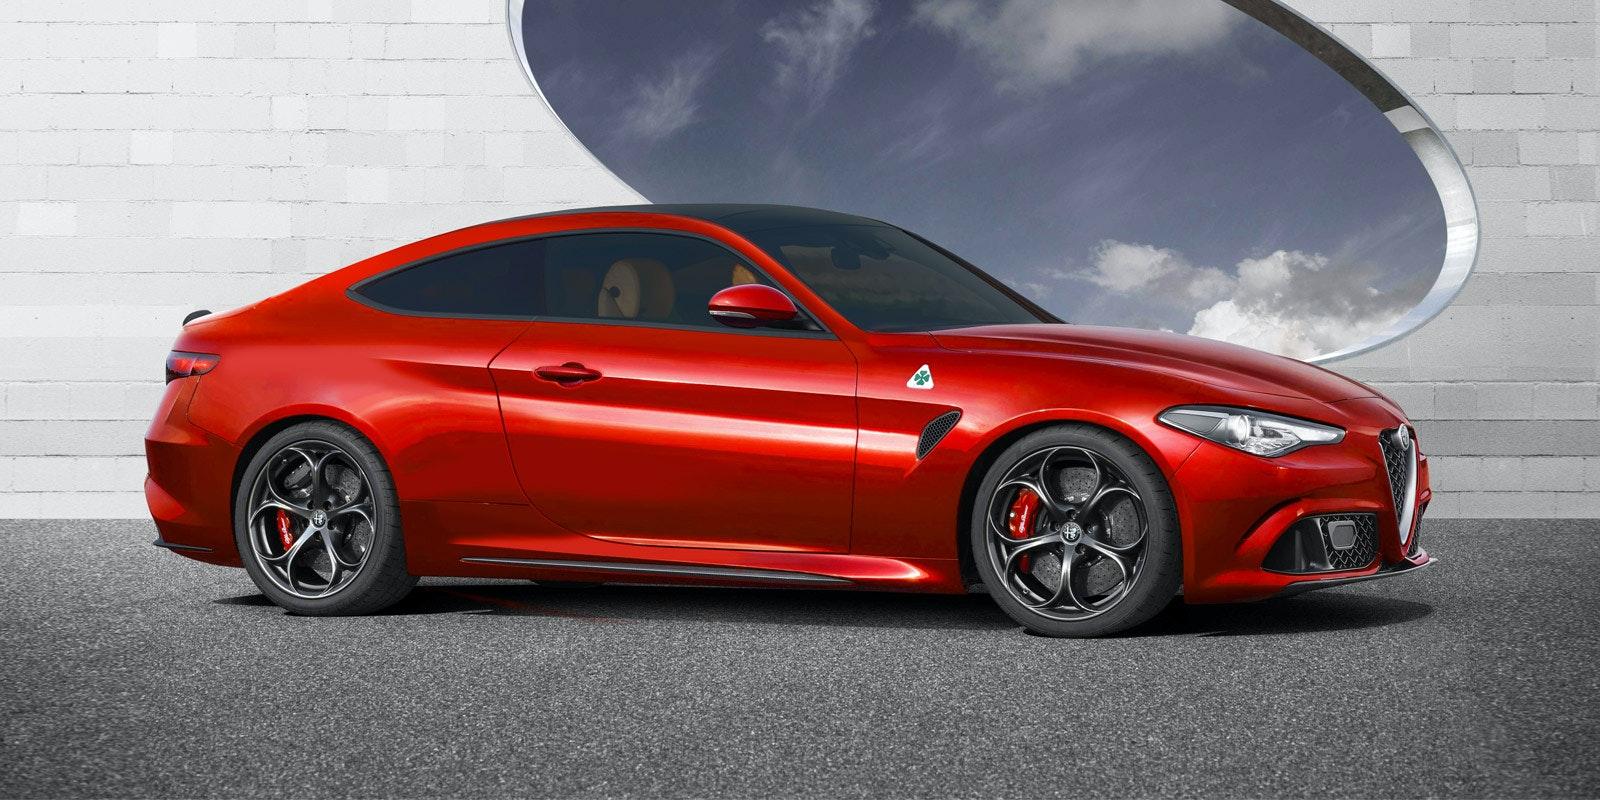 2019 Alfa Romeo Giulia Coupe Gtv Price Specs And Release Date Carwow